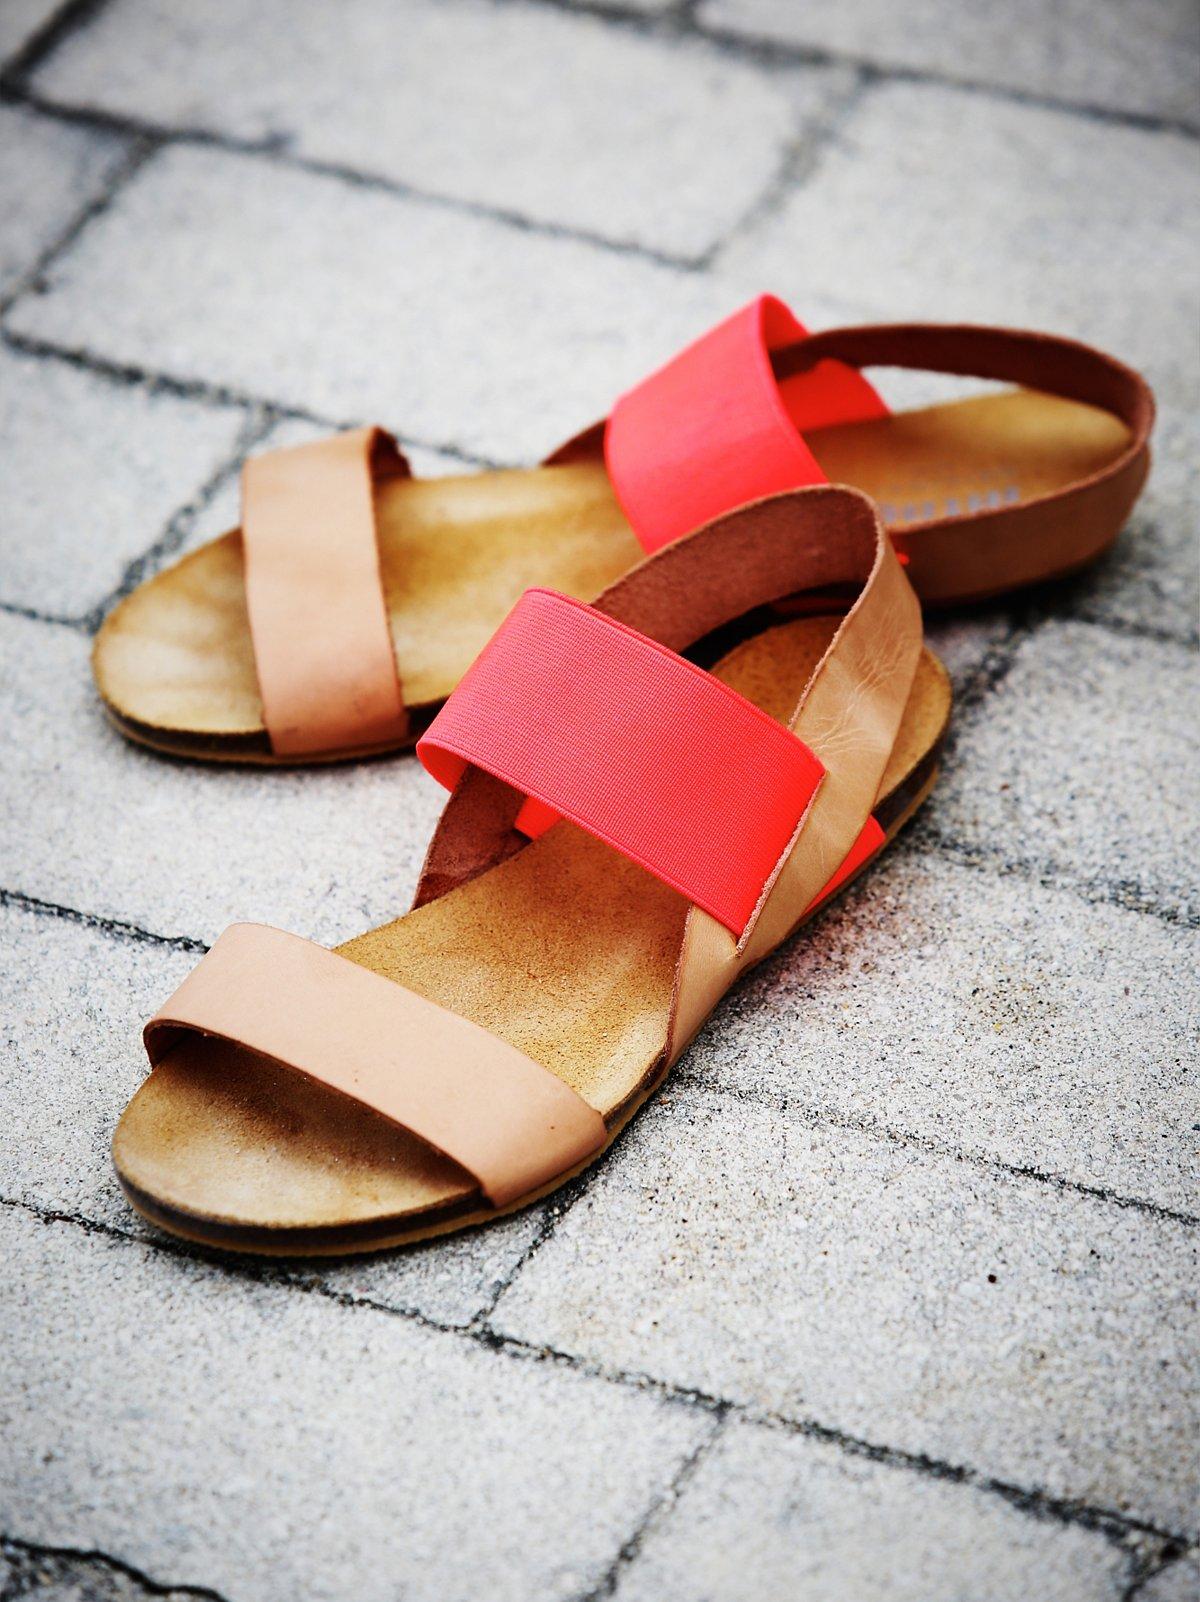 Sabler凉鞋